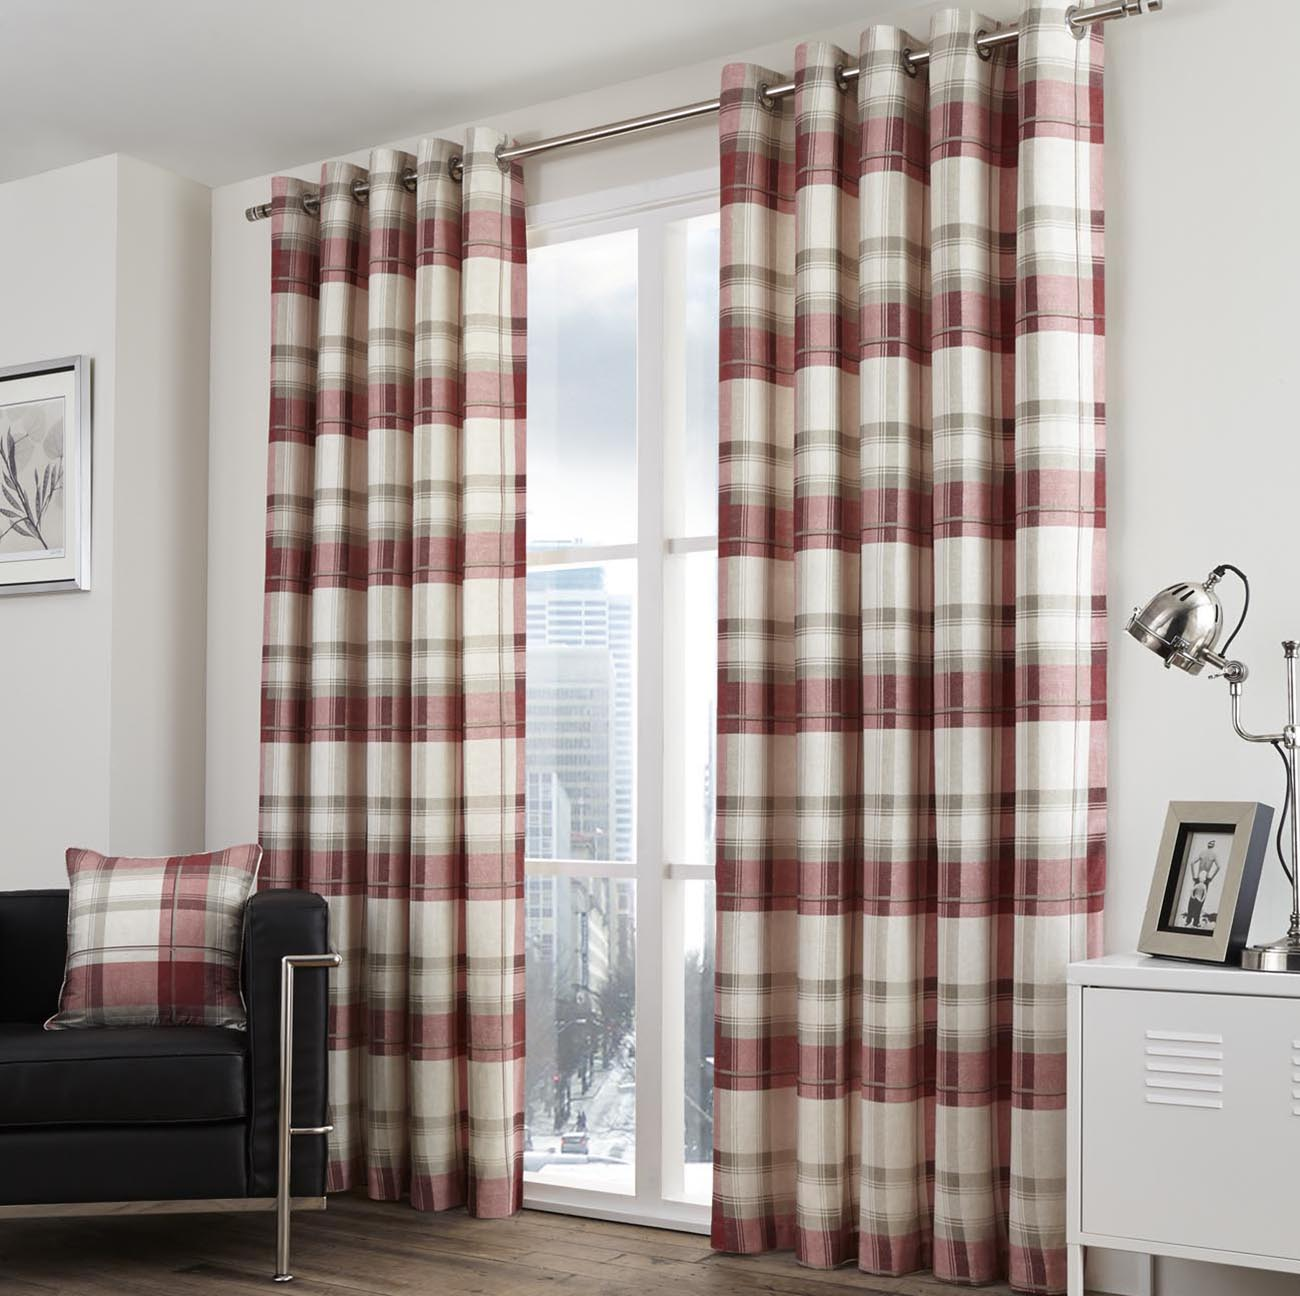 Lounge Dining & Fabrics